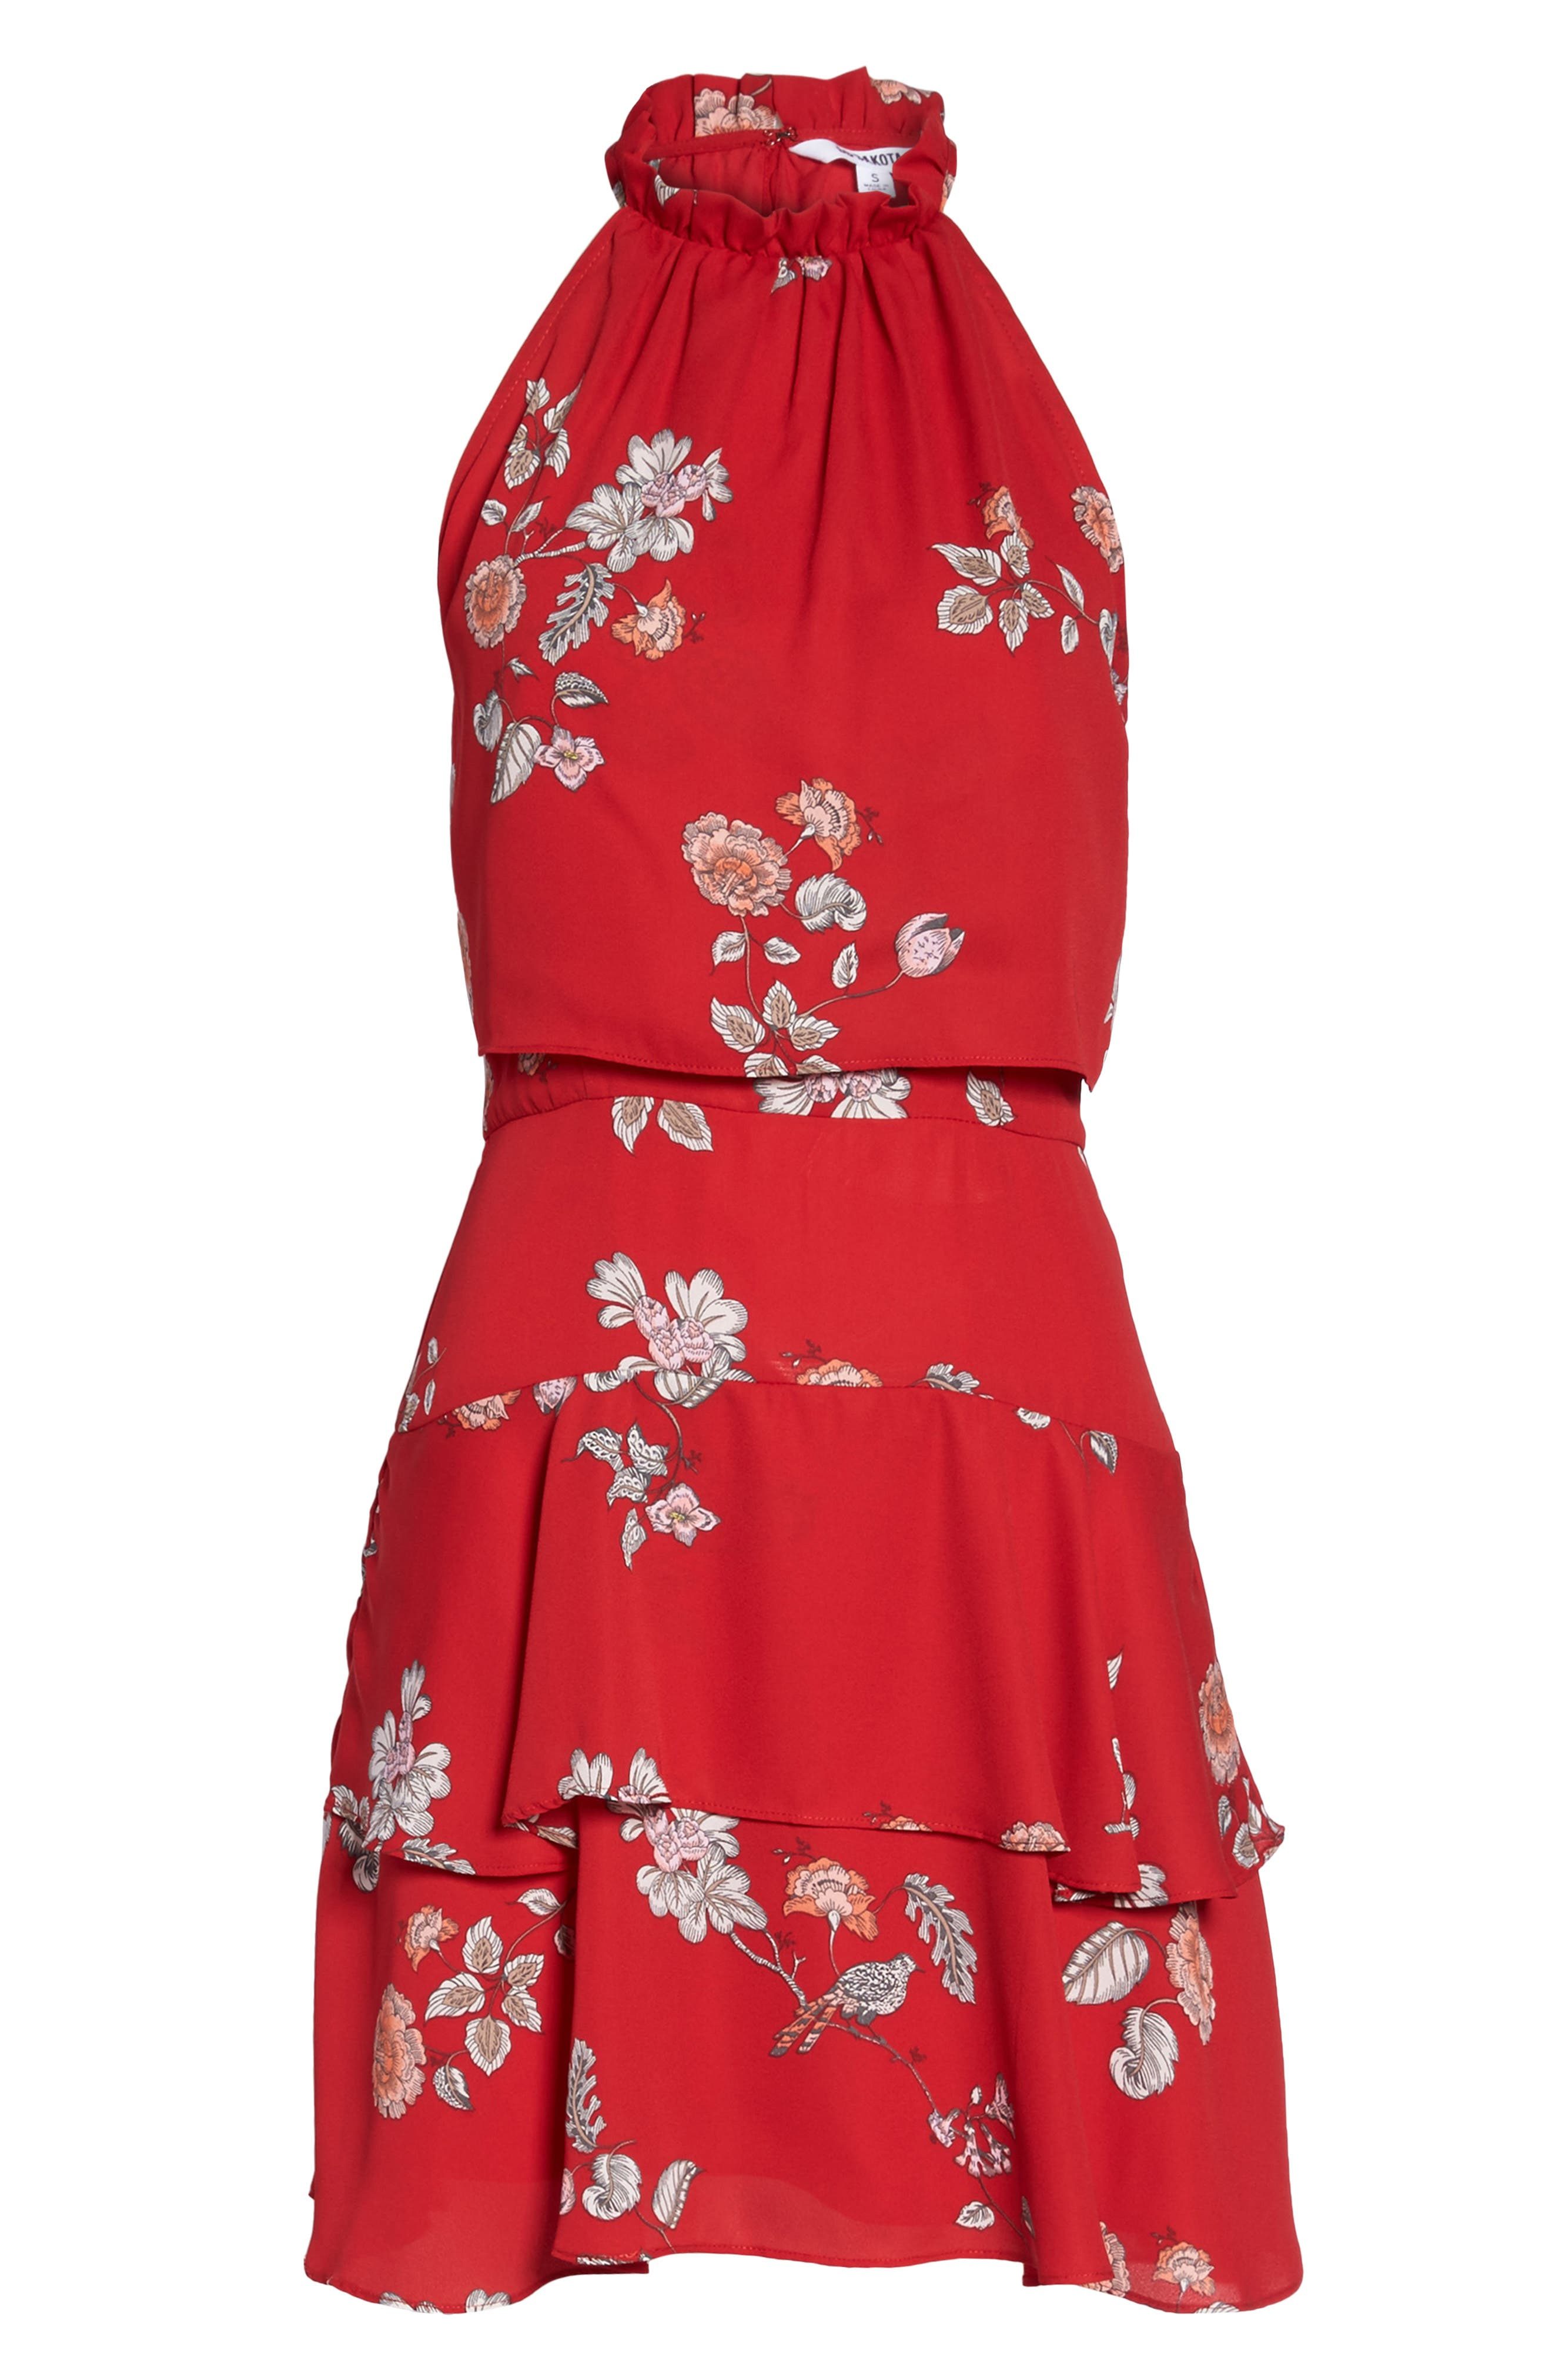 Cadence Ruffle Halter Dress,                             Alternate thumbnail 6, color,                             600